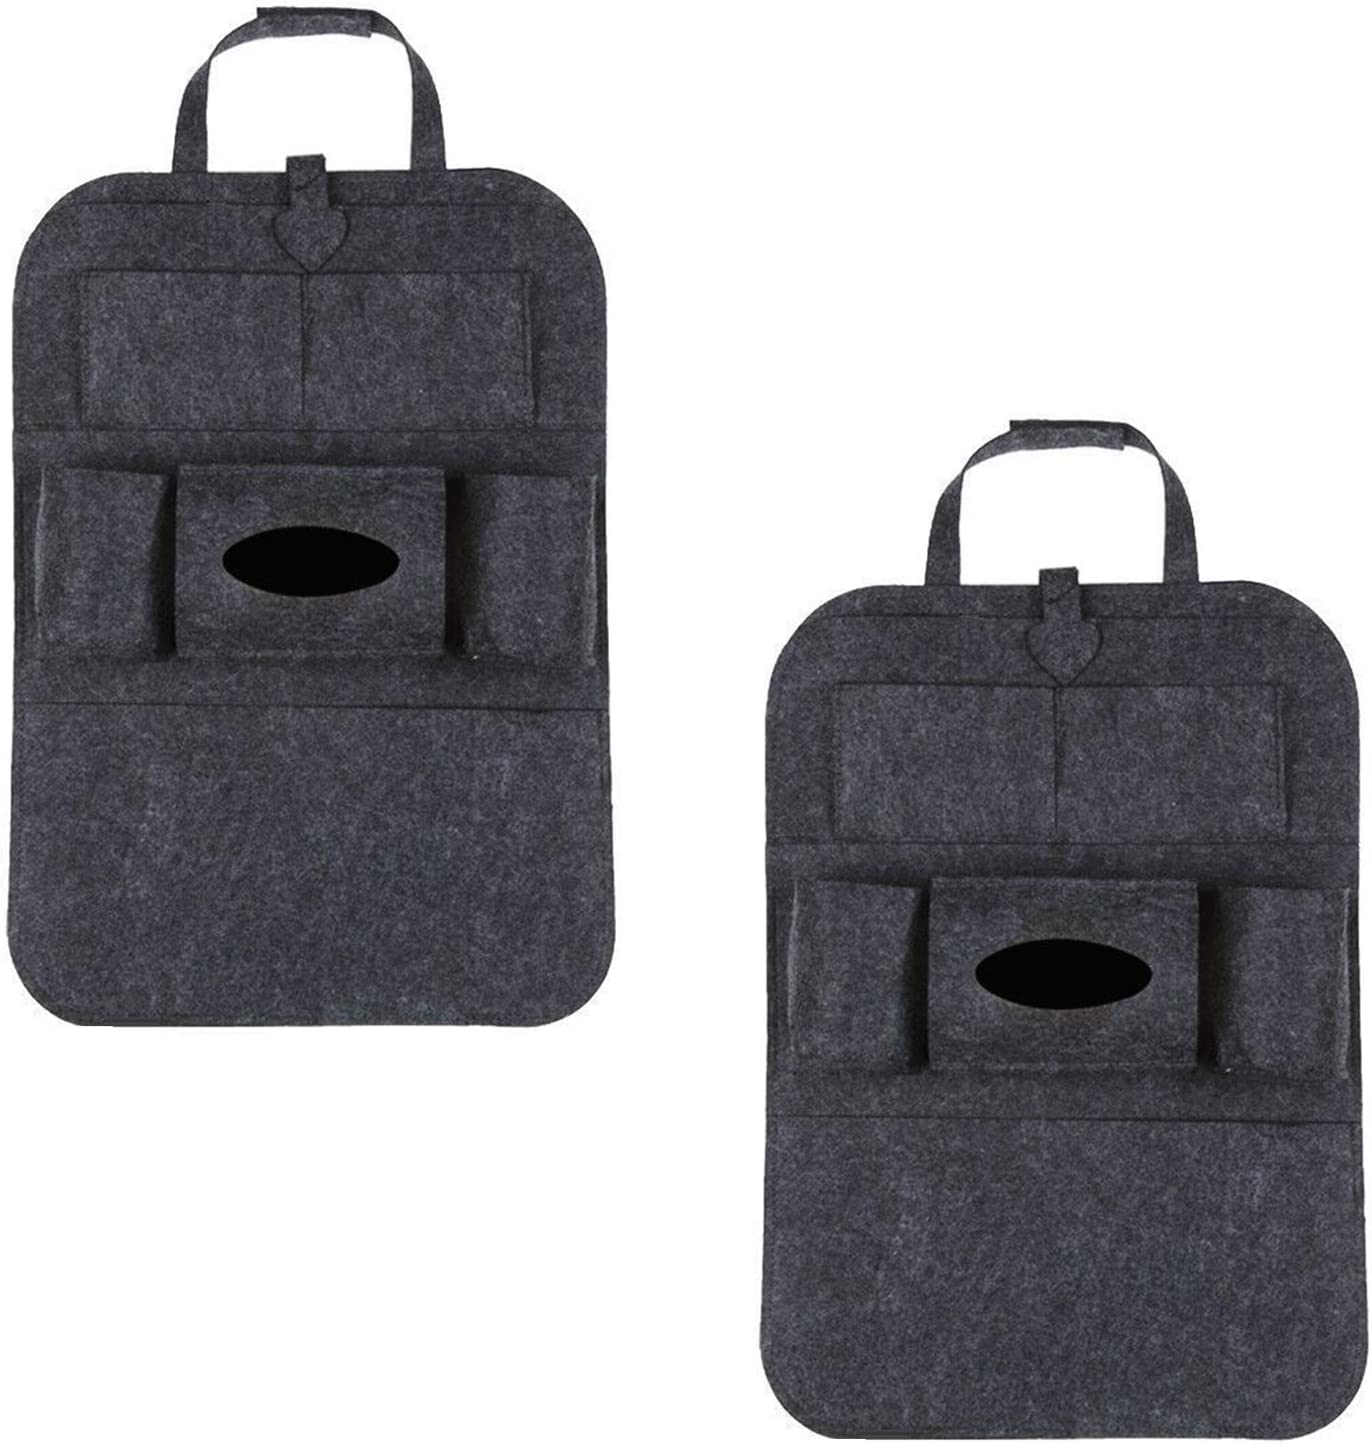 N\O Heiqlay Car Backseat Organizer Car Seat Storage Bag Universal Car Back Seat Organiser Car Bin Car Storage Organiser 40x56cm 2pcs Multi-pocket Car Organisation Black